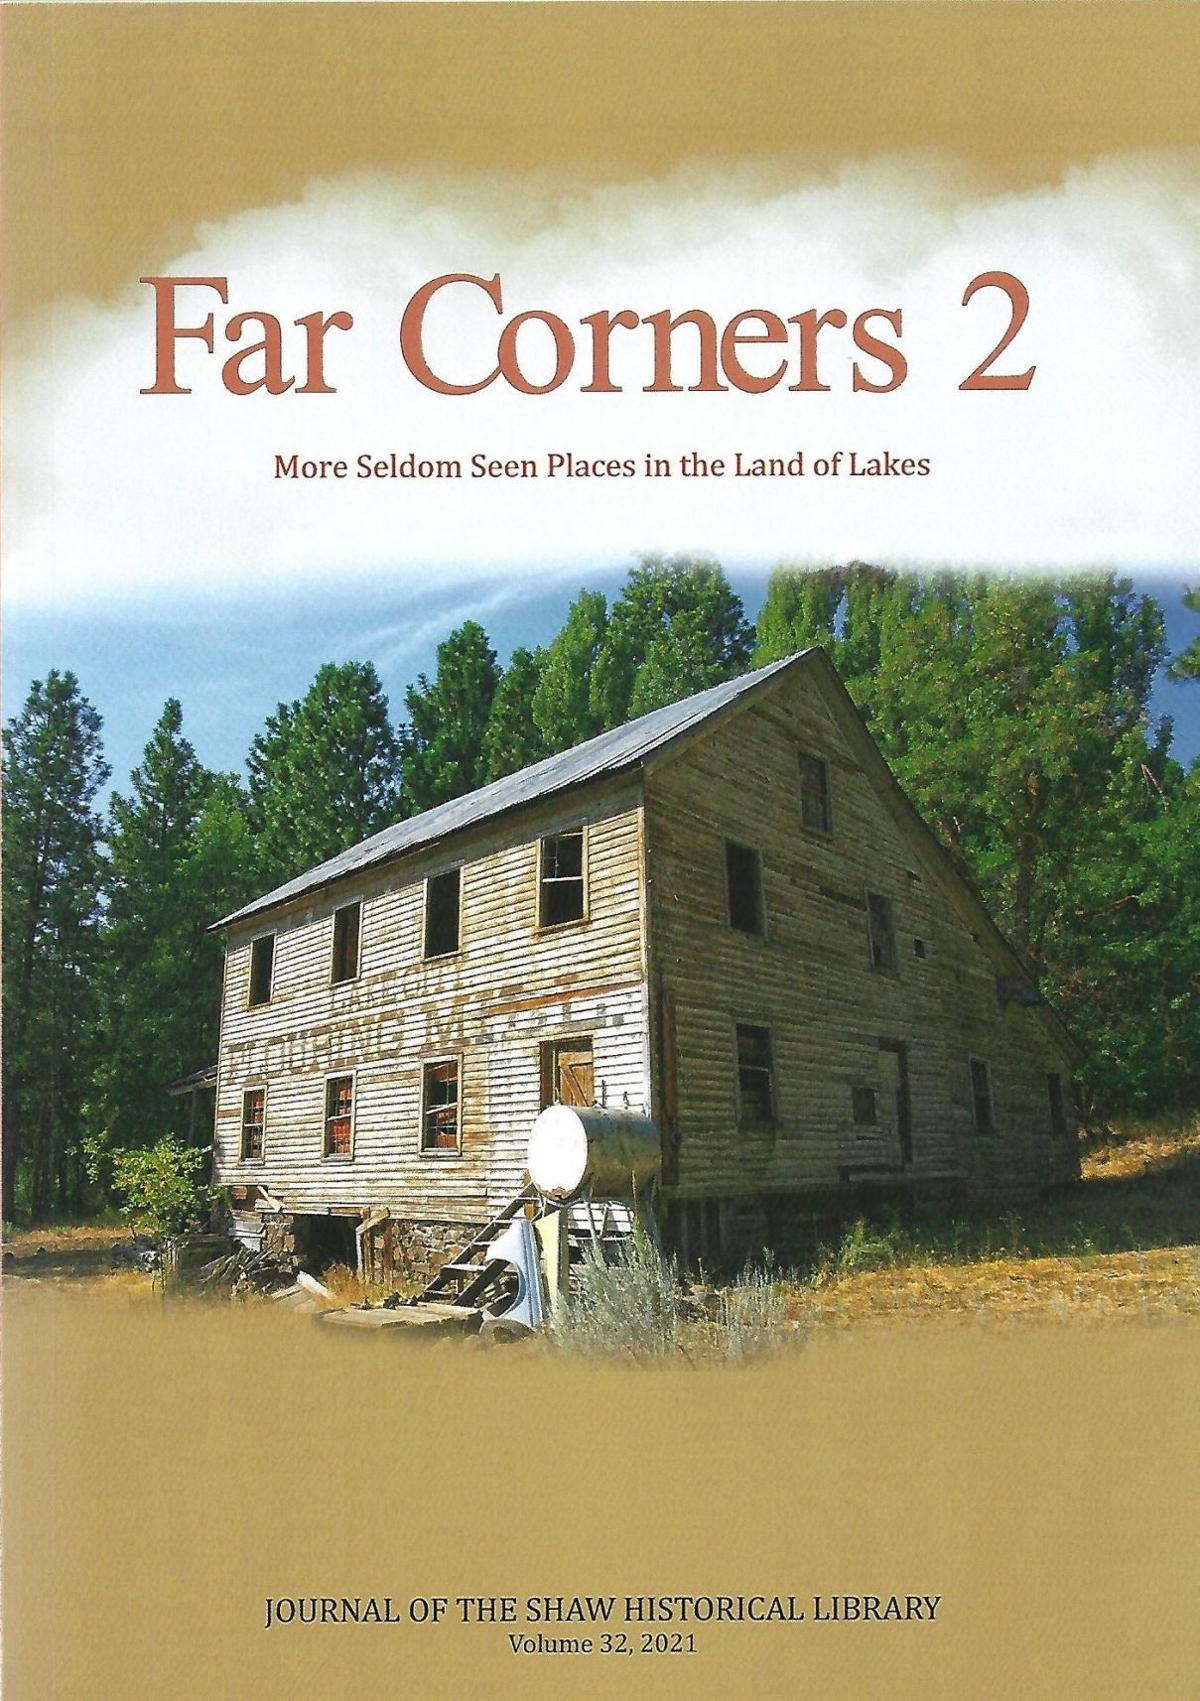 Far Corners 2